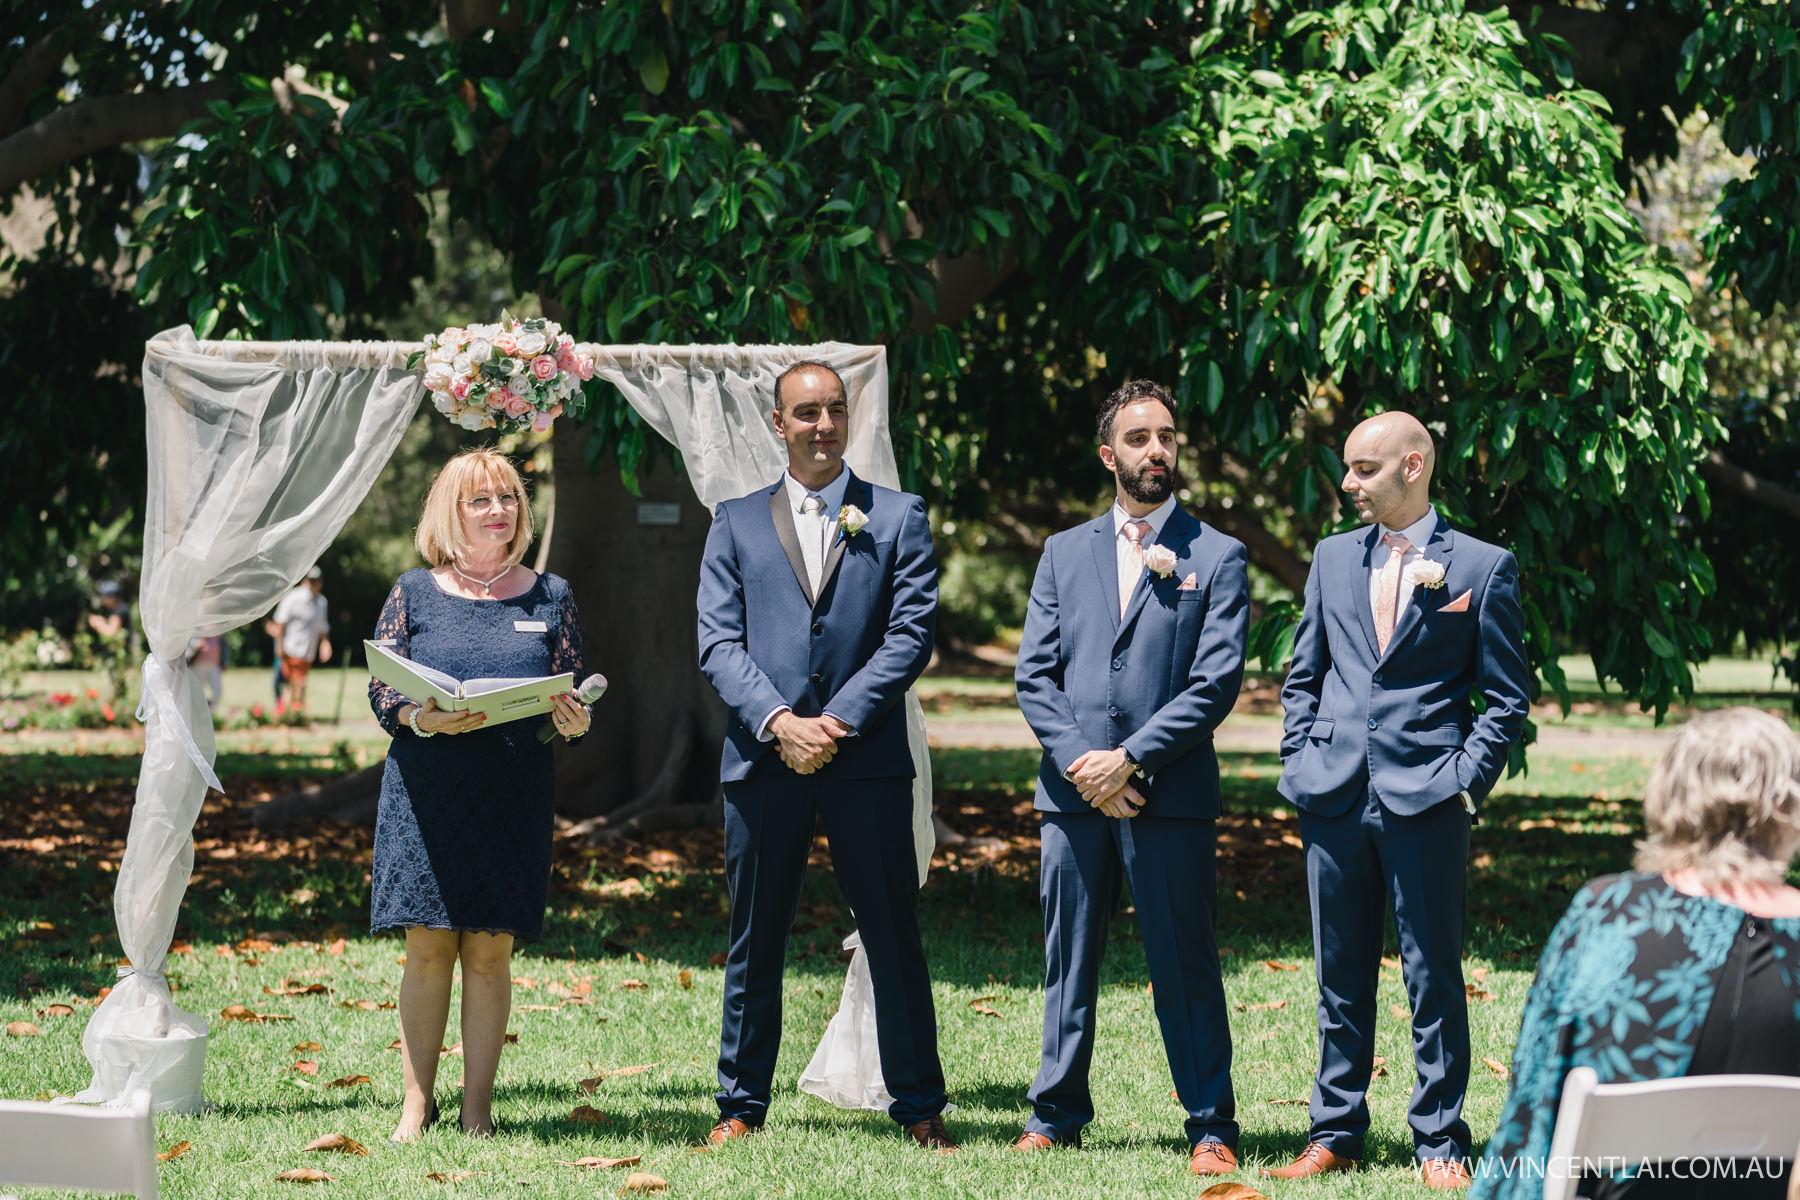 Wedding at RoyalBotanicGarden'sRose Garden Pavilion and Lawn